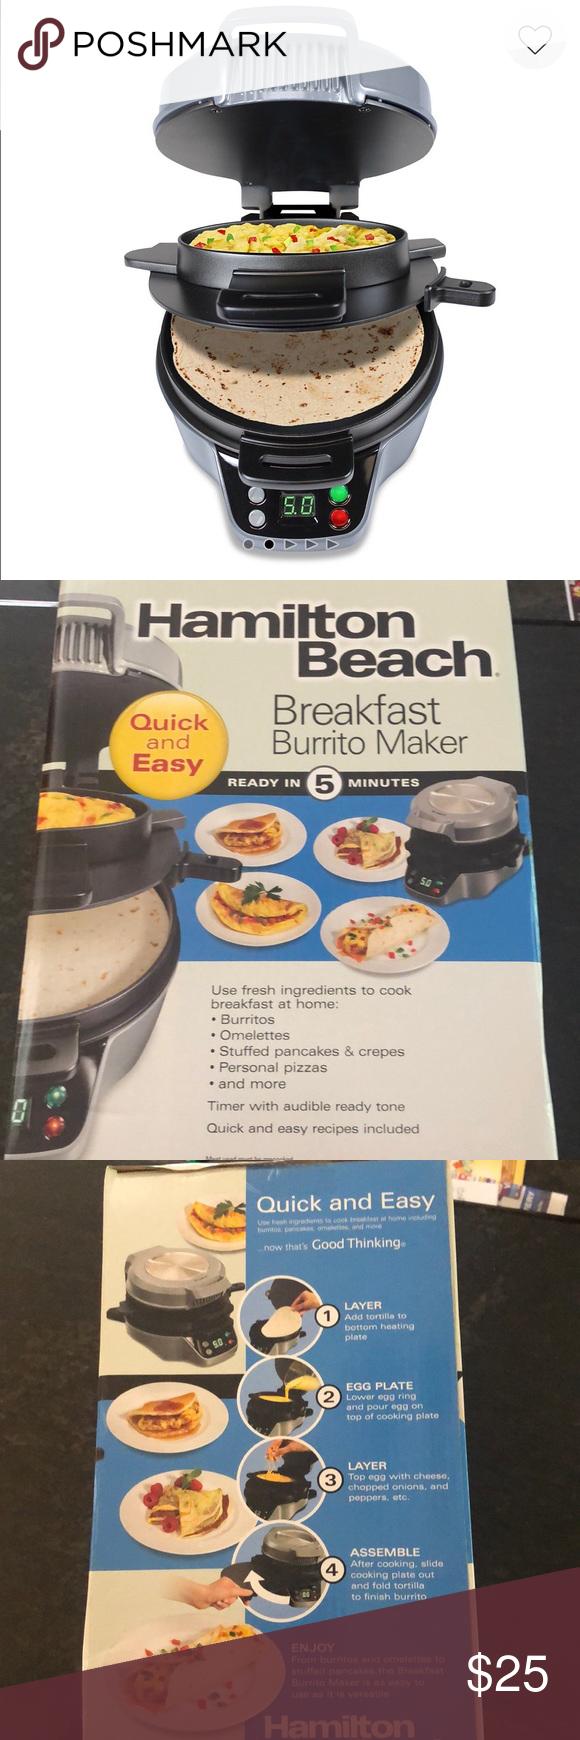 New Hamilton Beach Breakfast Burrito Maker Breakfast Burritos Hamilton Beach Pizza And More